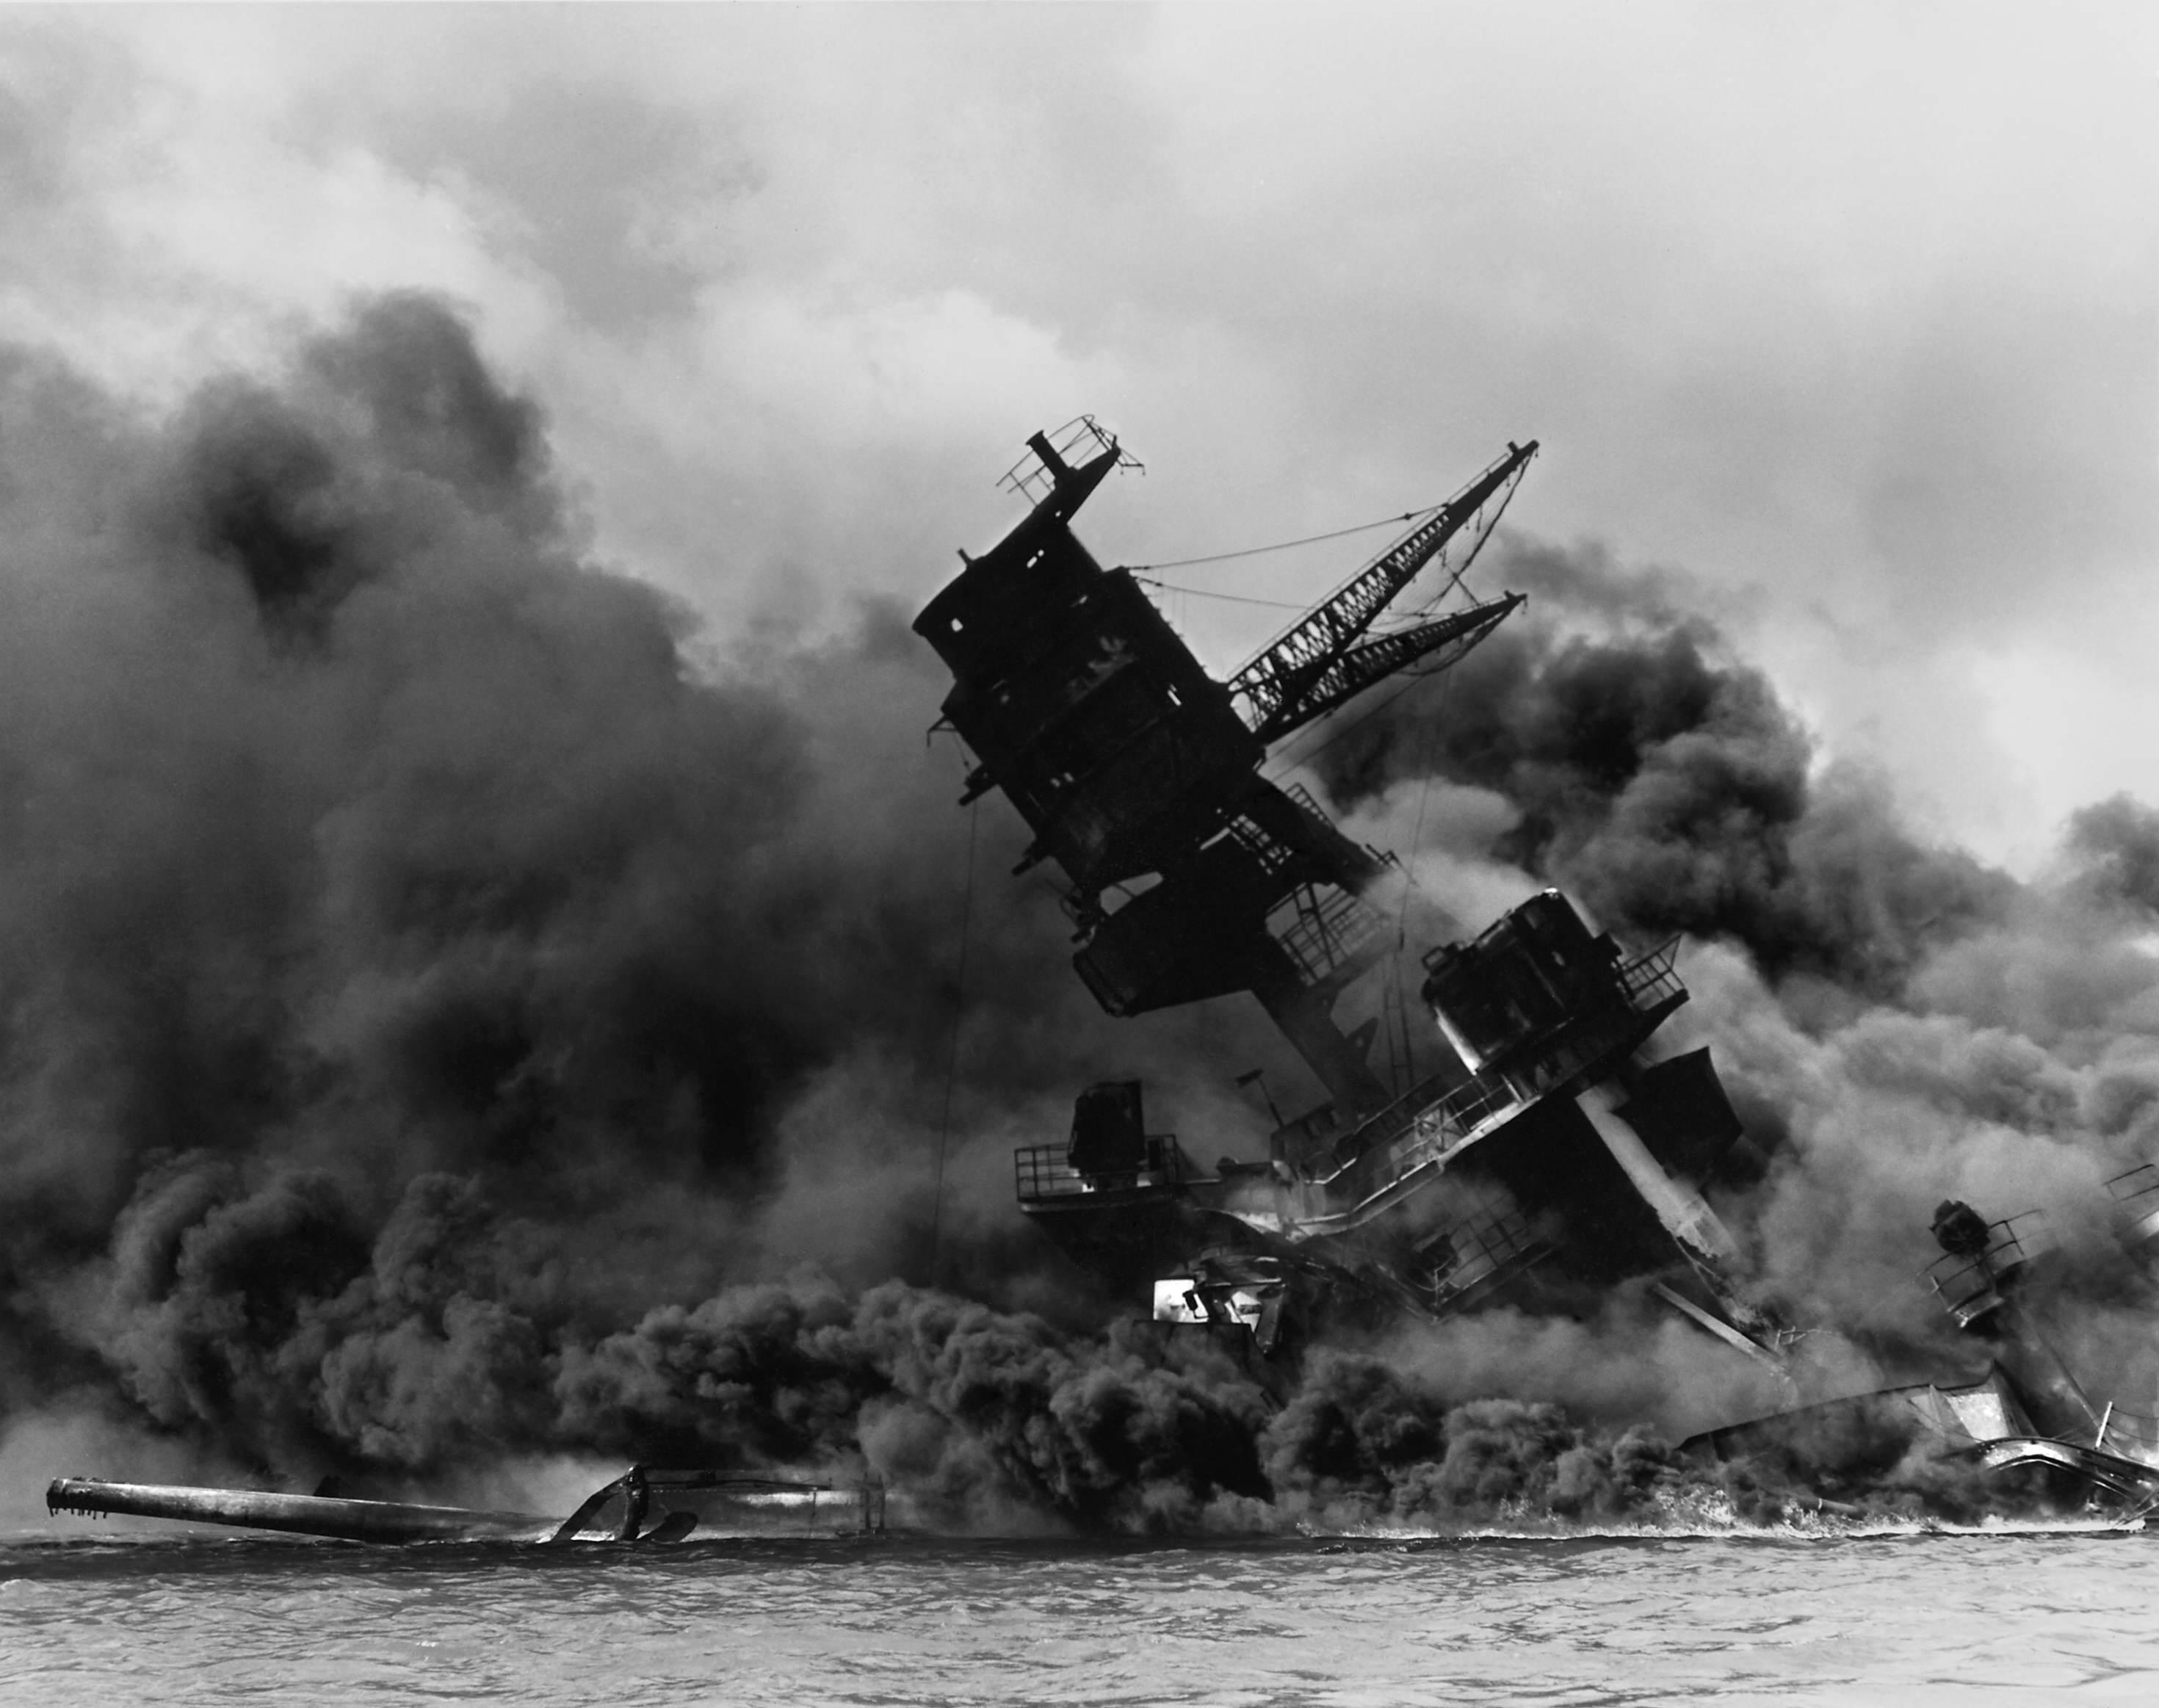 The USS Arizona (BB 39) burning after the Japanese attack on Pearl Harbor   NARA 195617   Edit - Le USS Arizona s'effondre lors de l'attaque de Pearl Harbor